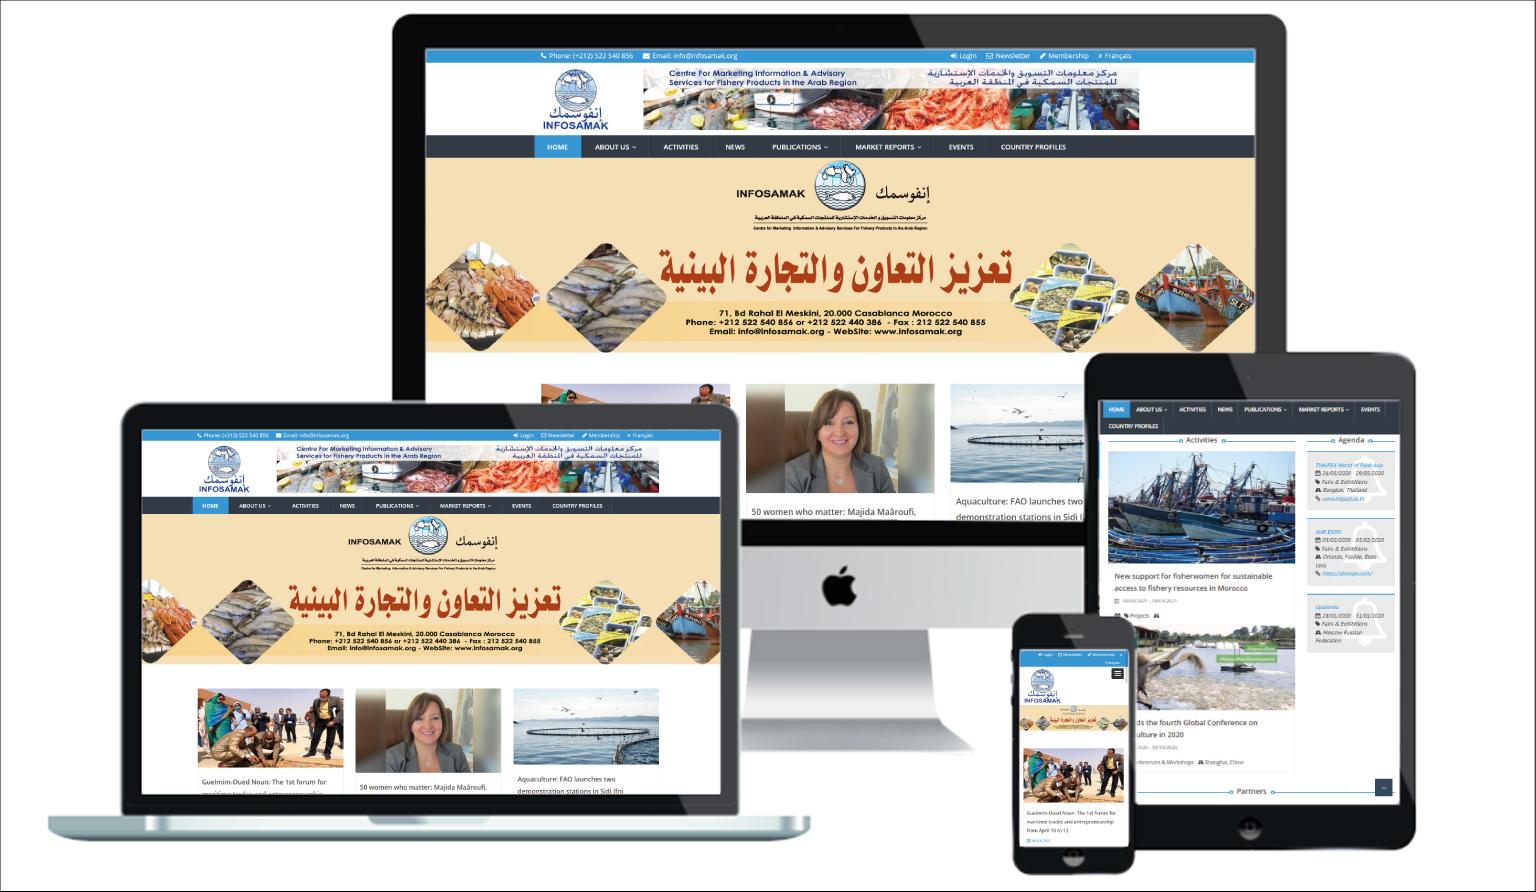 www.infosamak.org